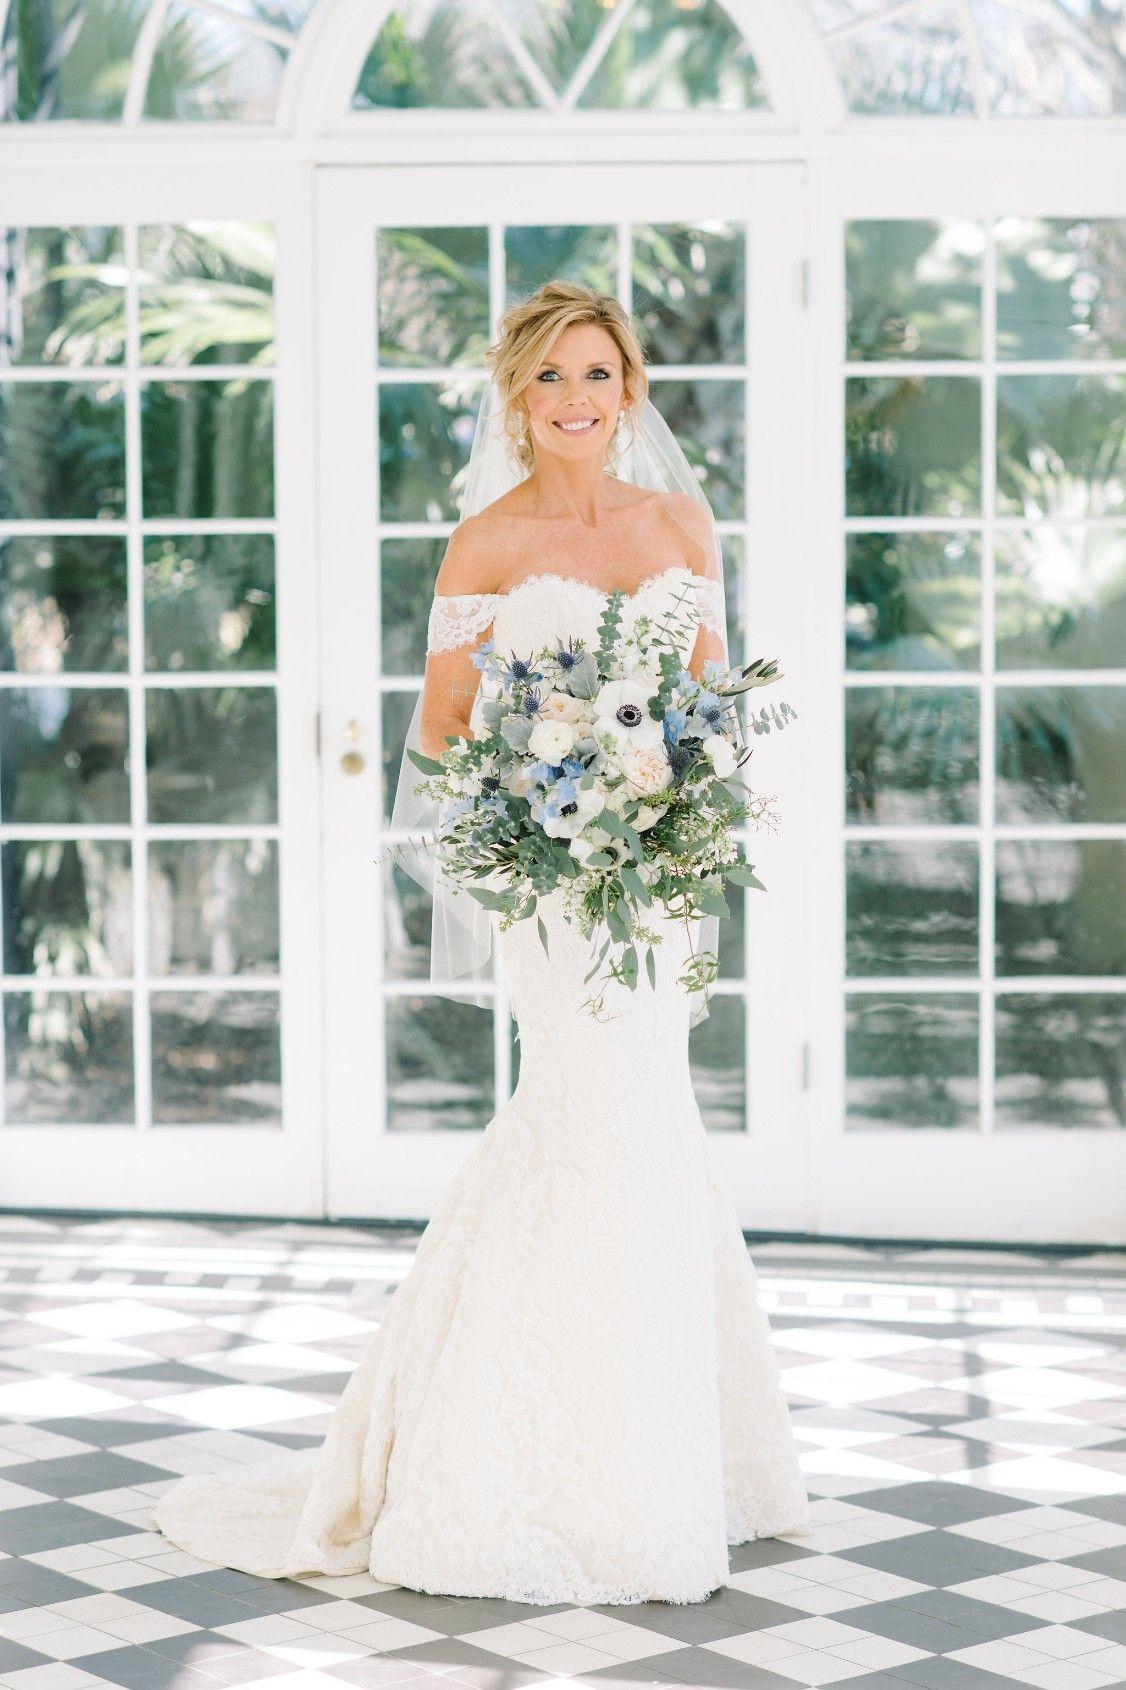 Wedding dresses rental  Pretty Pastel Winter Wedding at Lowndes Grove  Pretty pastel